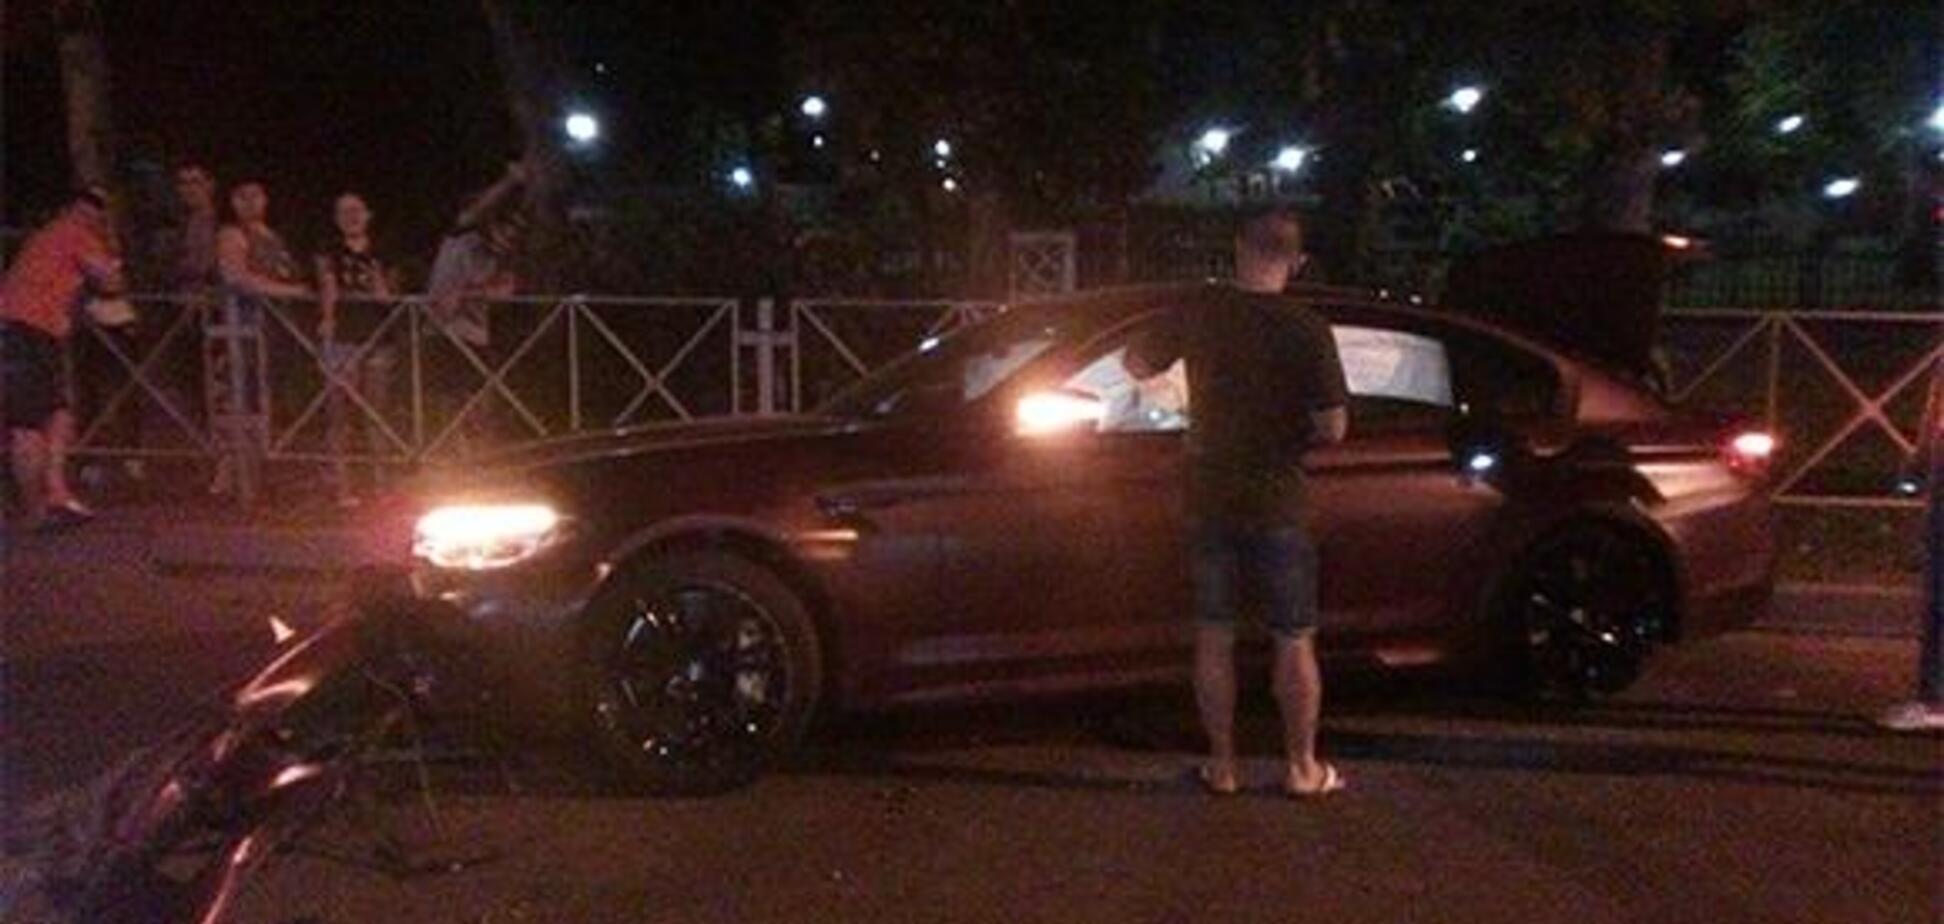 Лучший футболист России разбил авто за 9 млн: фотофакт